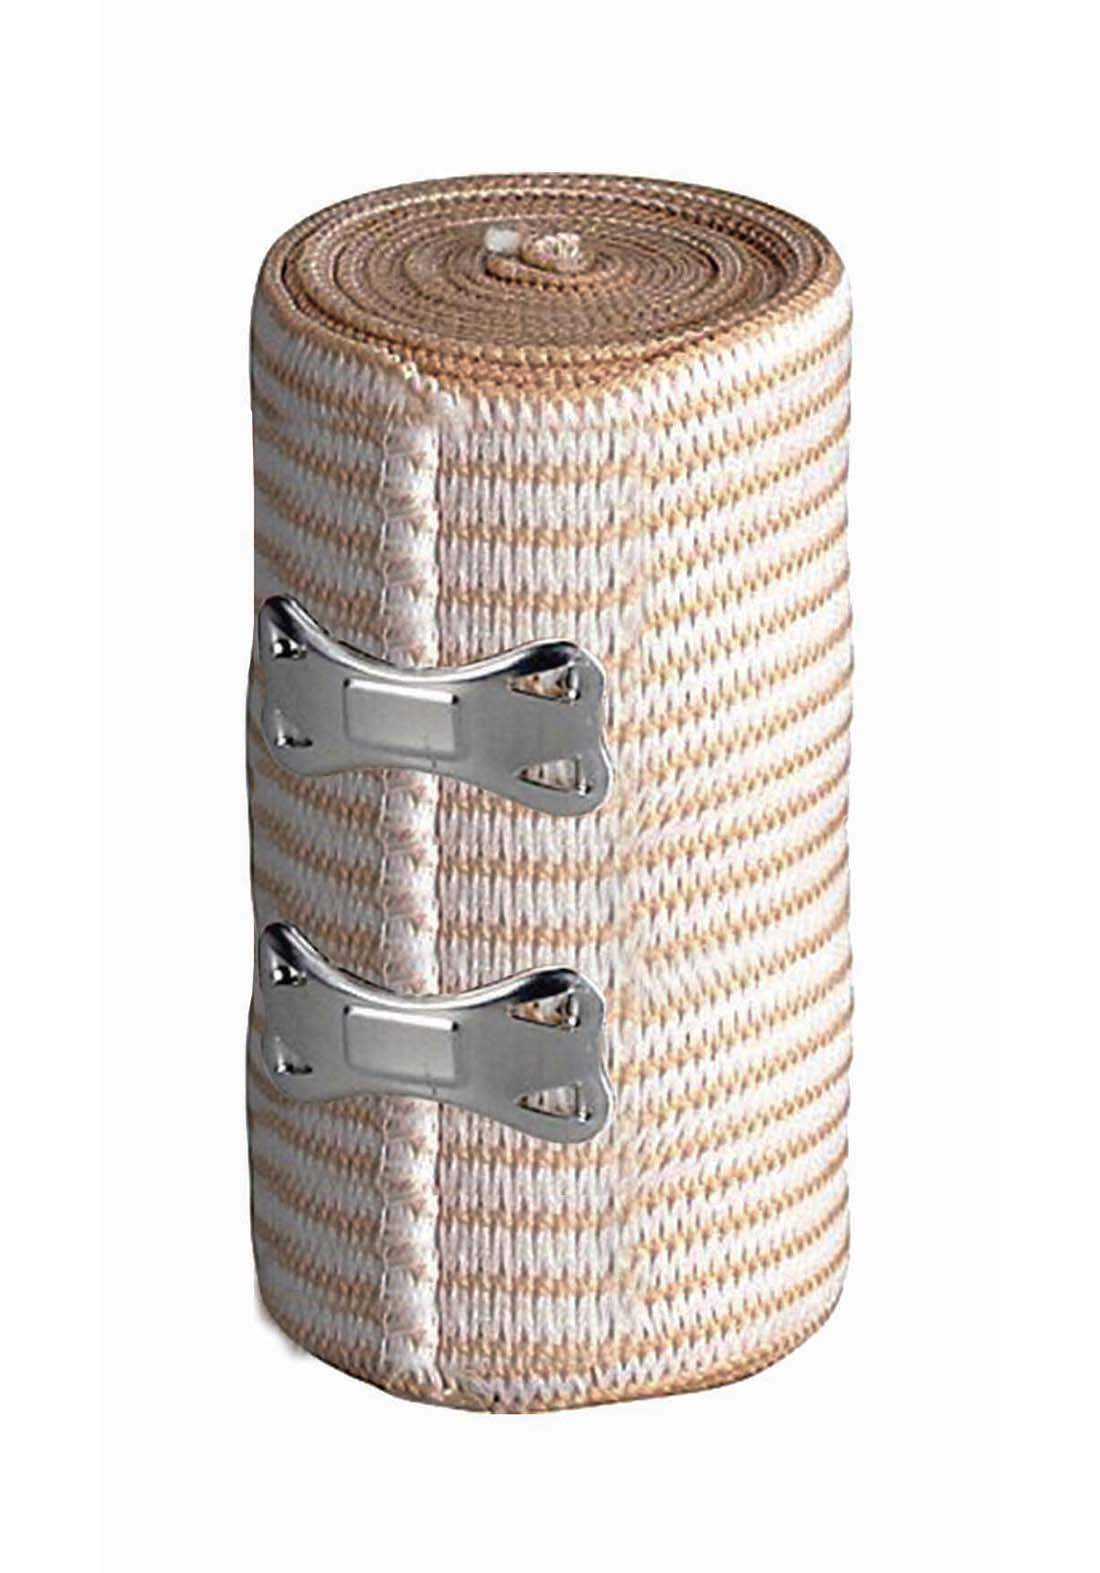 Optimal medical elastic bandages with clips  7.5cm*4.5m  ضمادات طبية مطاطة بمشبك معدني